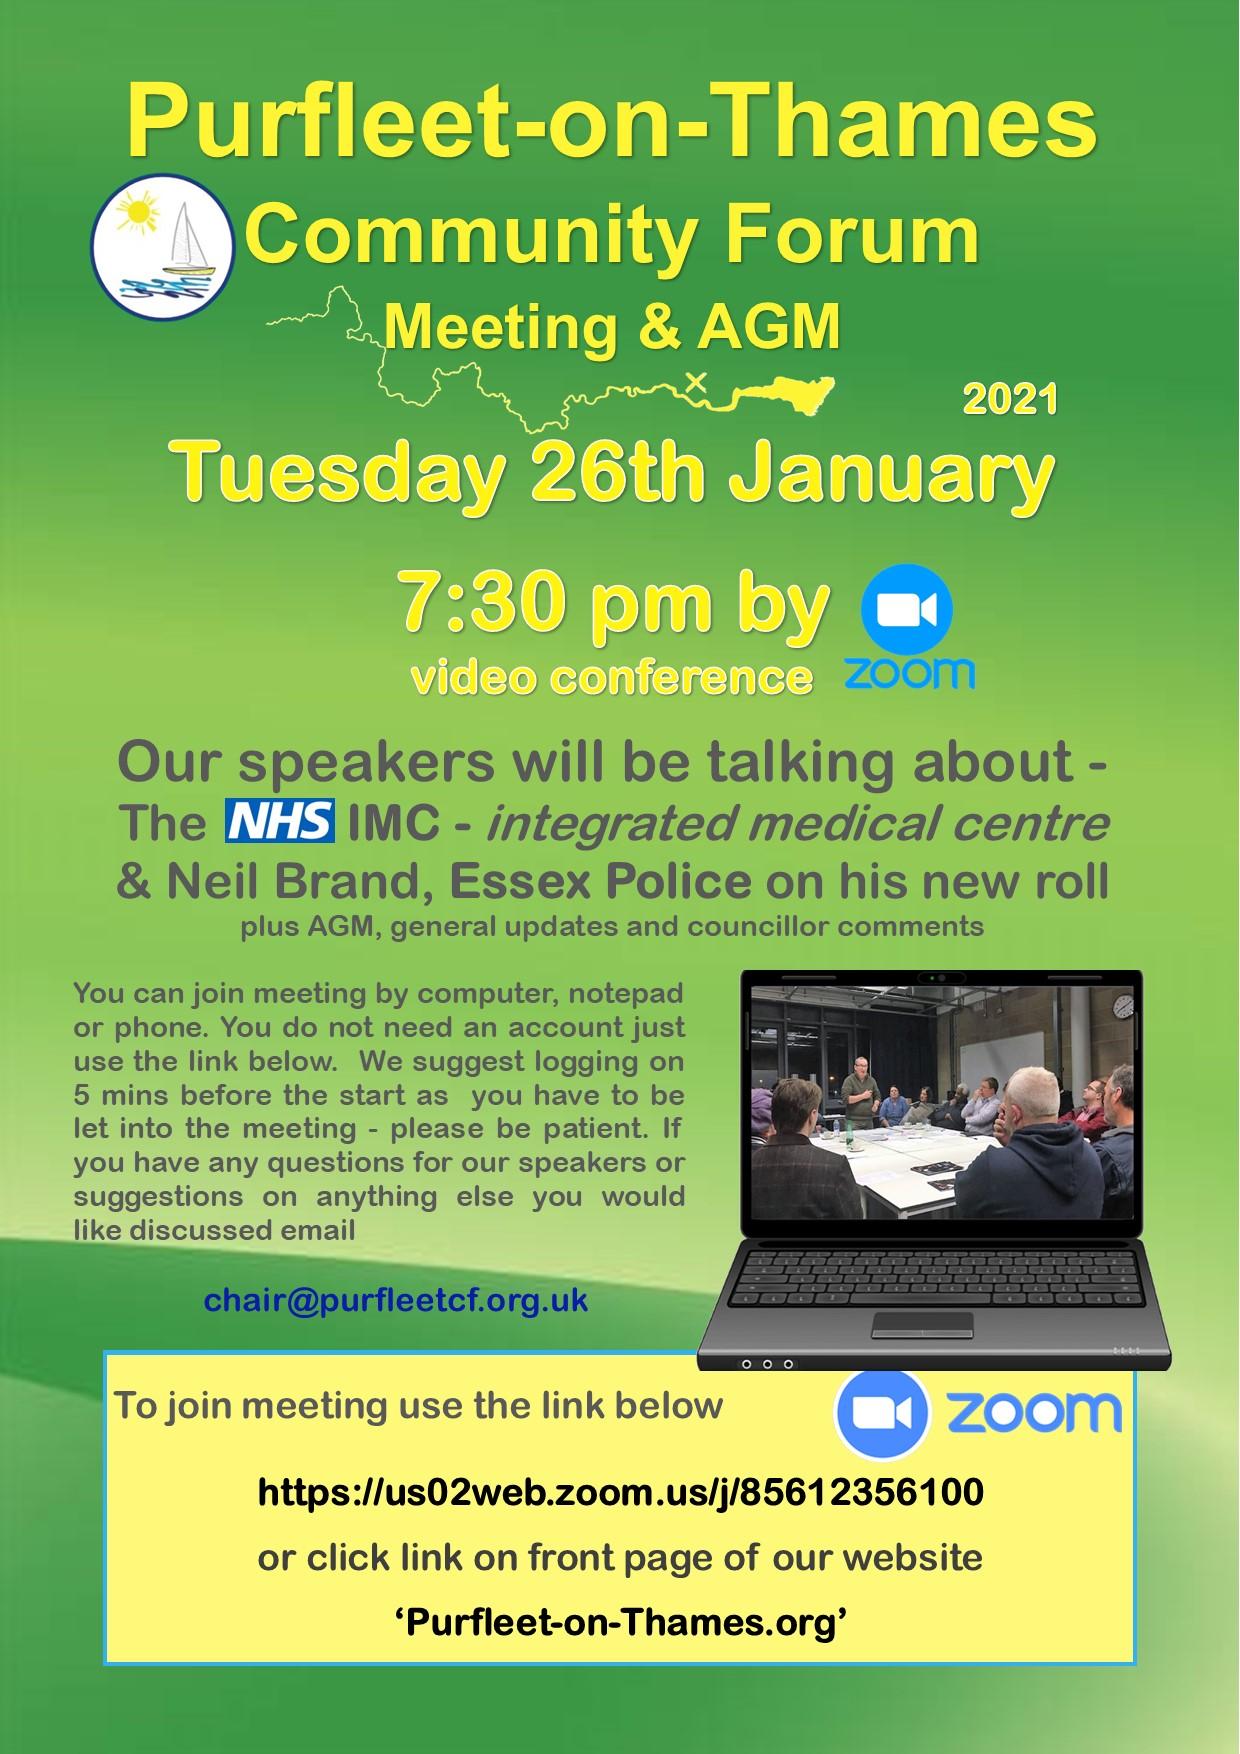 21.01.26 POTCF forum meeting & AGM